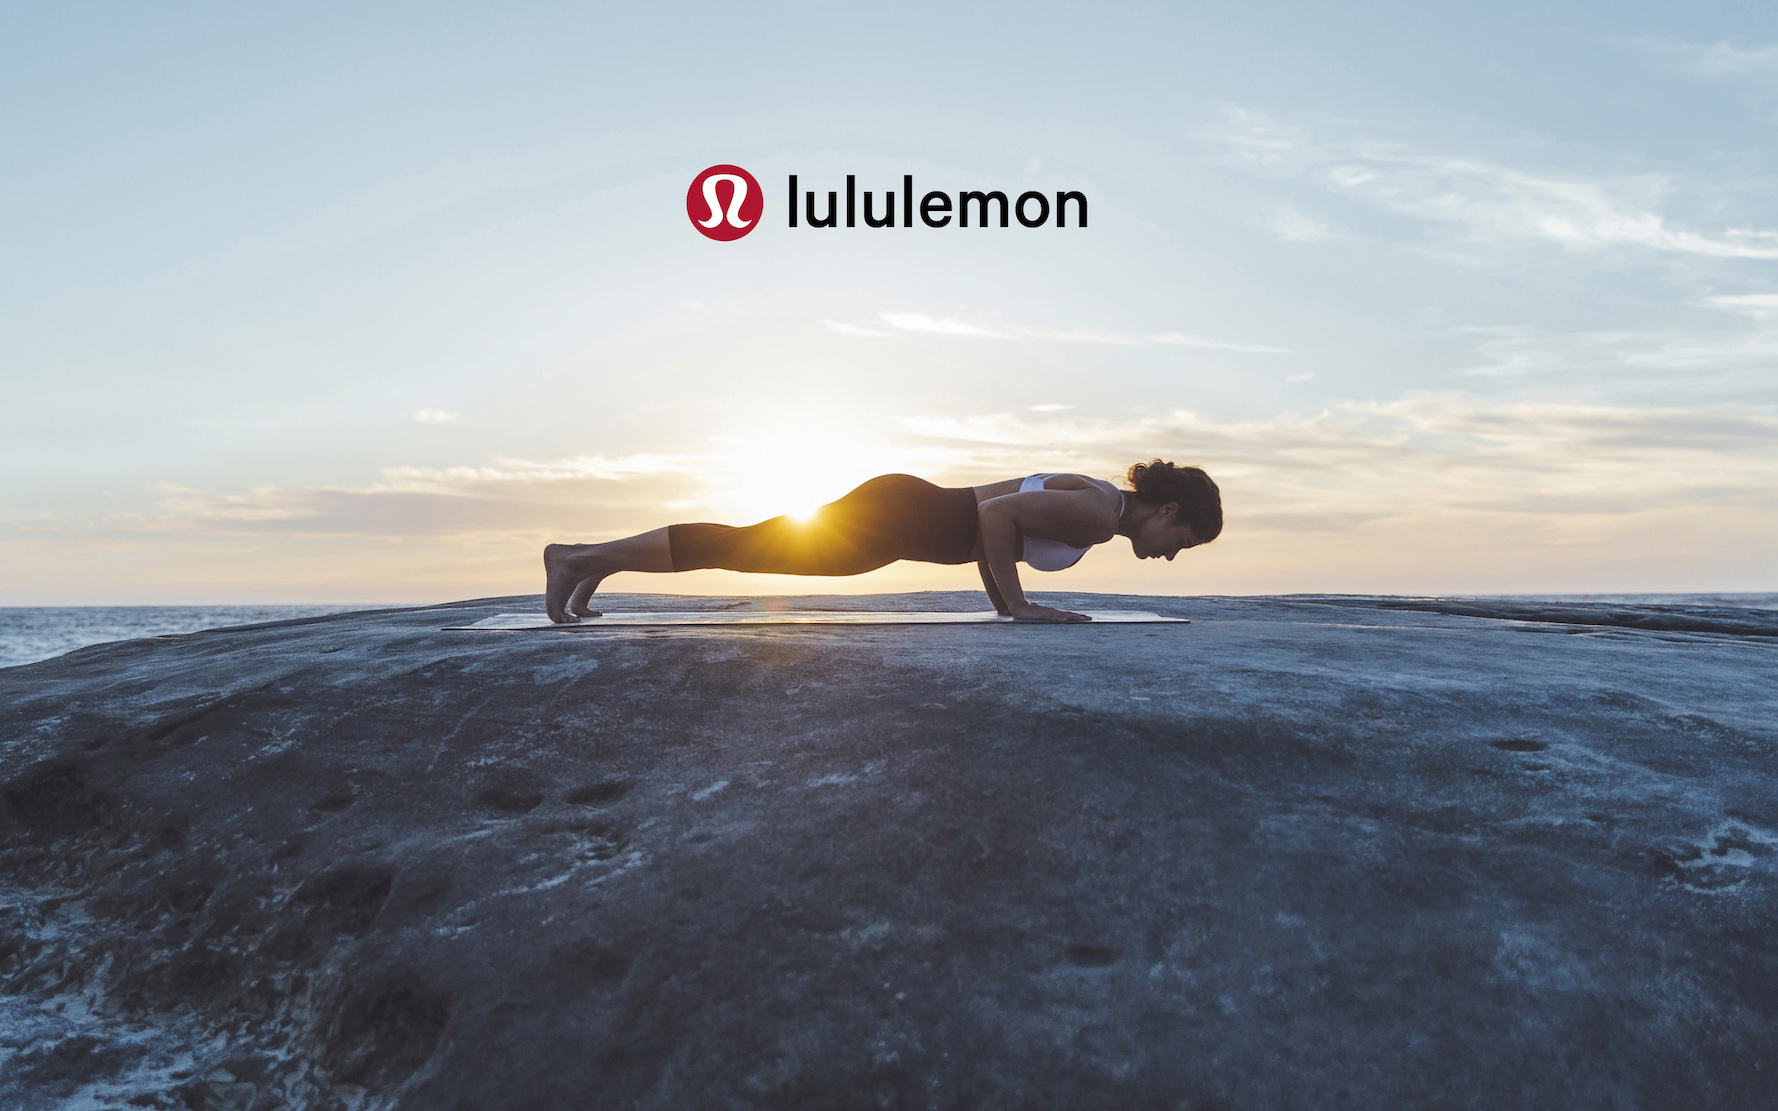 lululemon 五年增长战略:全渠道体验、产品创新以及市场扩张